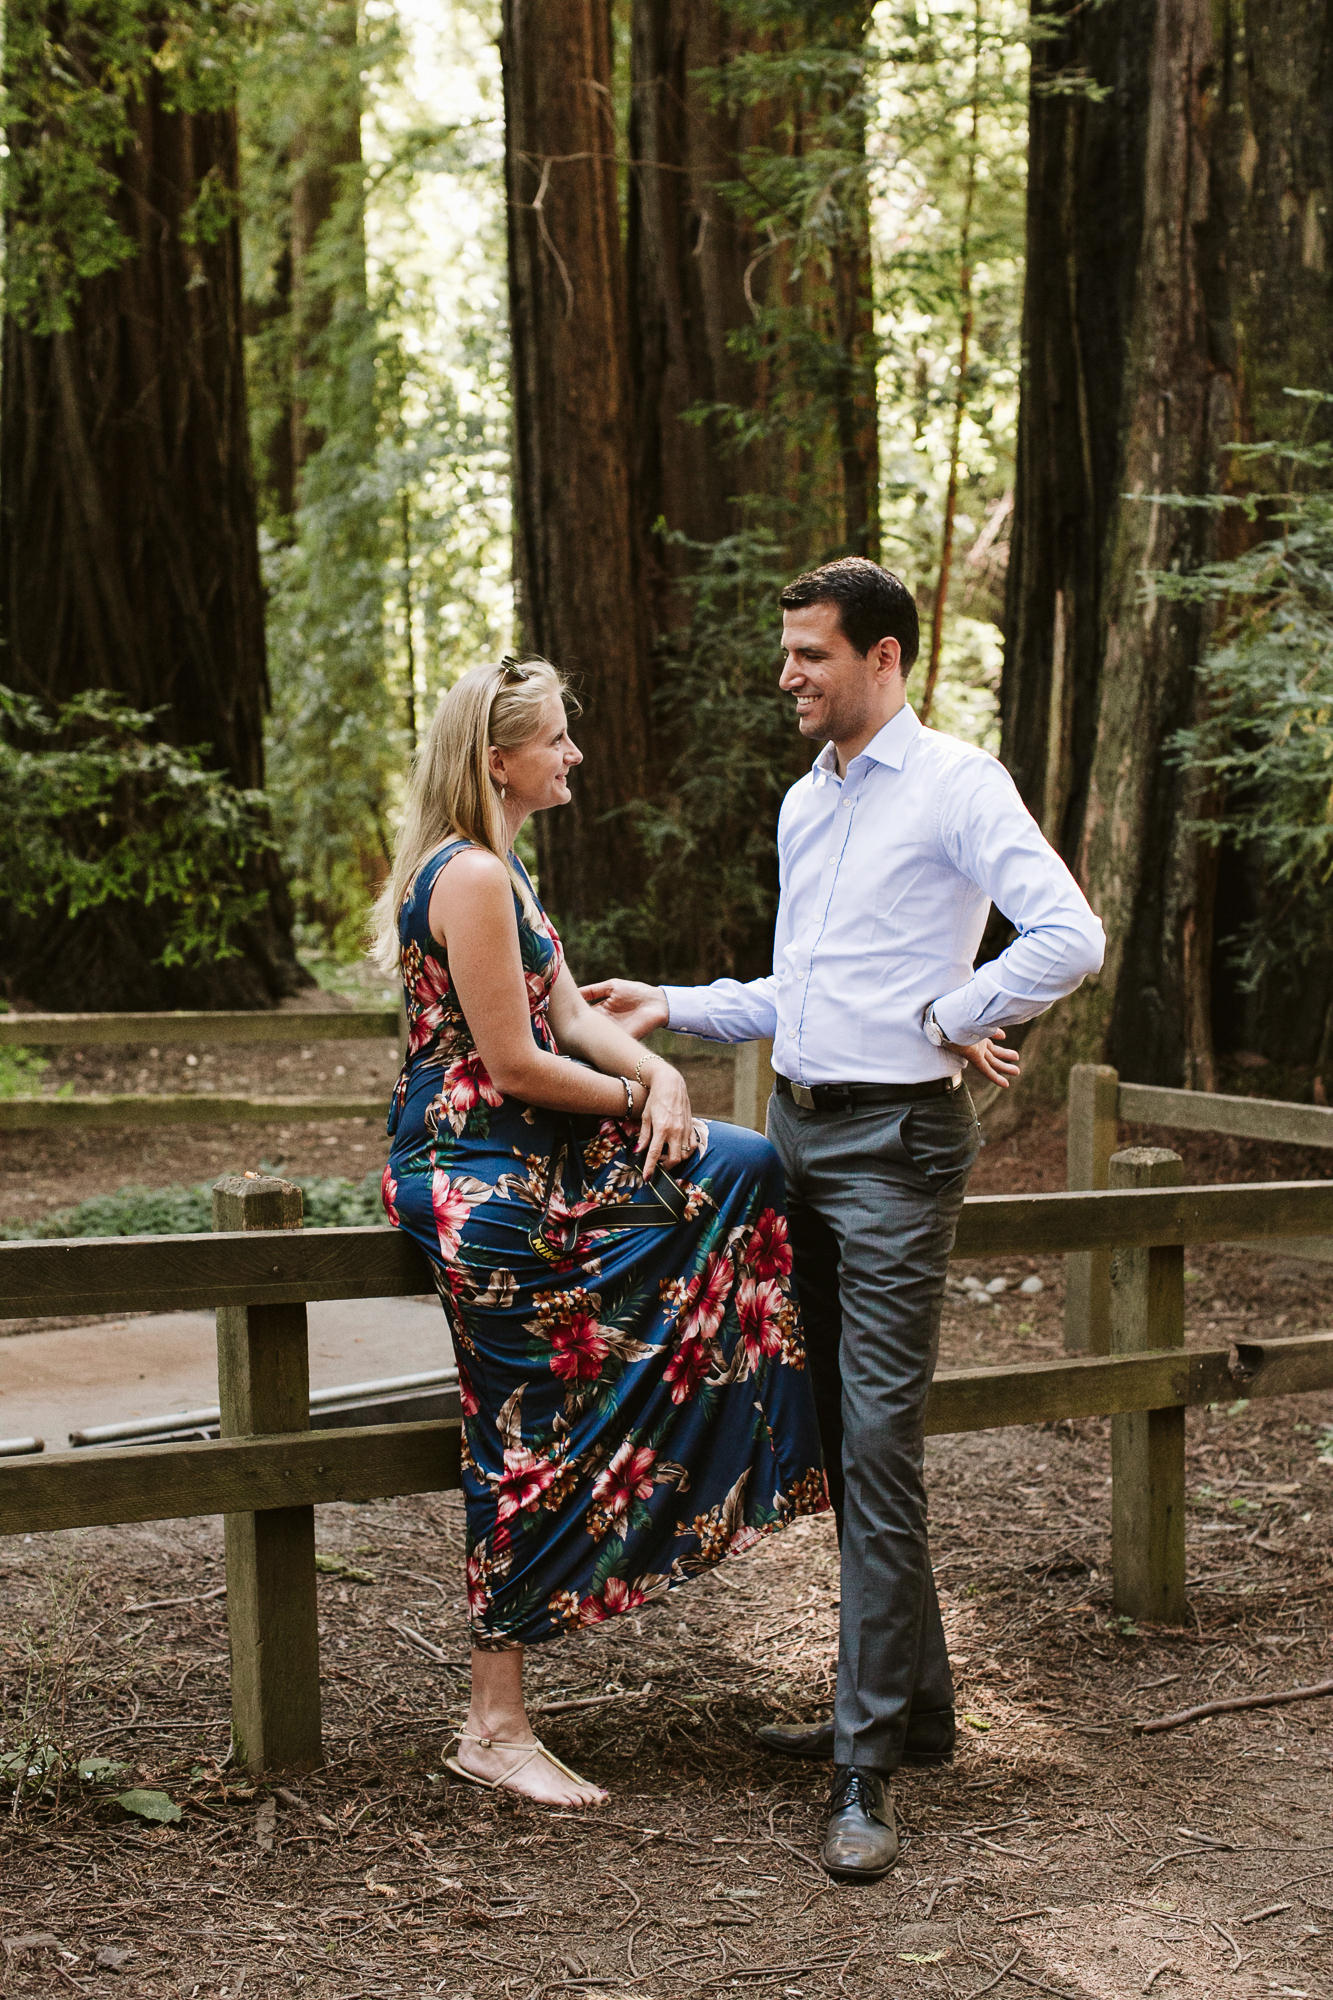 California-wedding-photographer-alfonso-flores-pamplin-groove-247.jpg